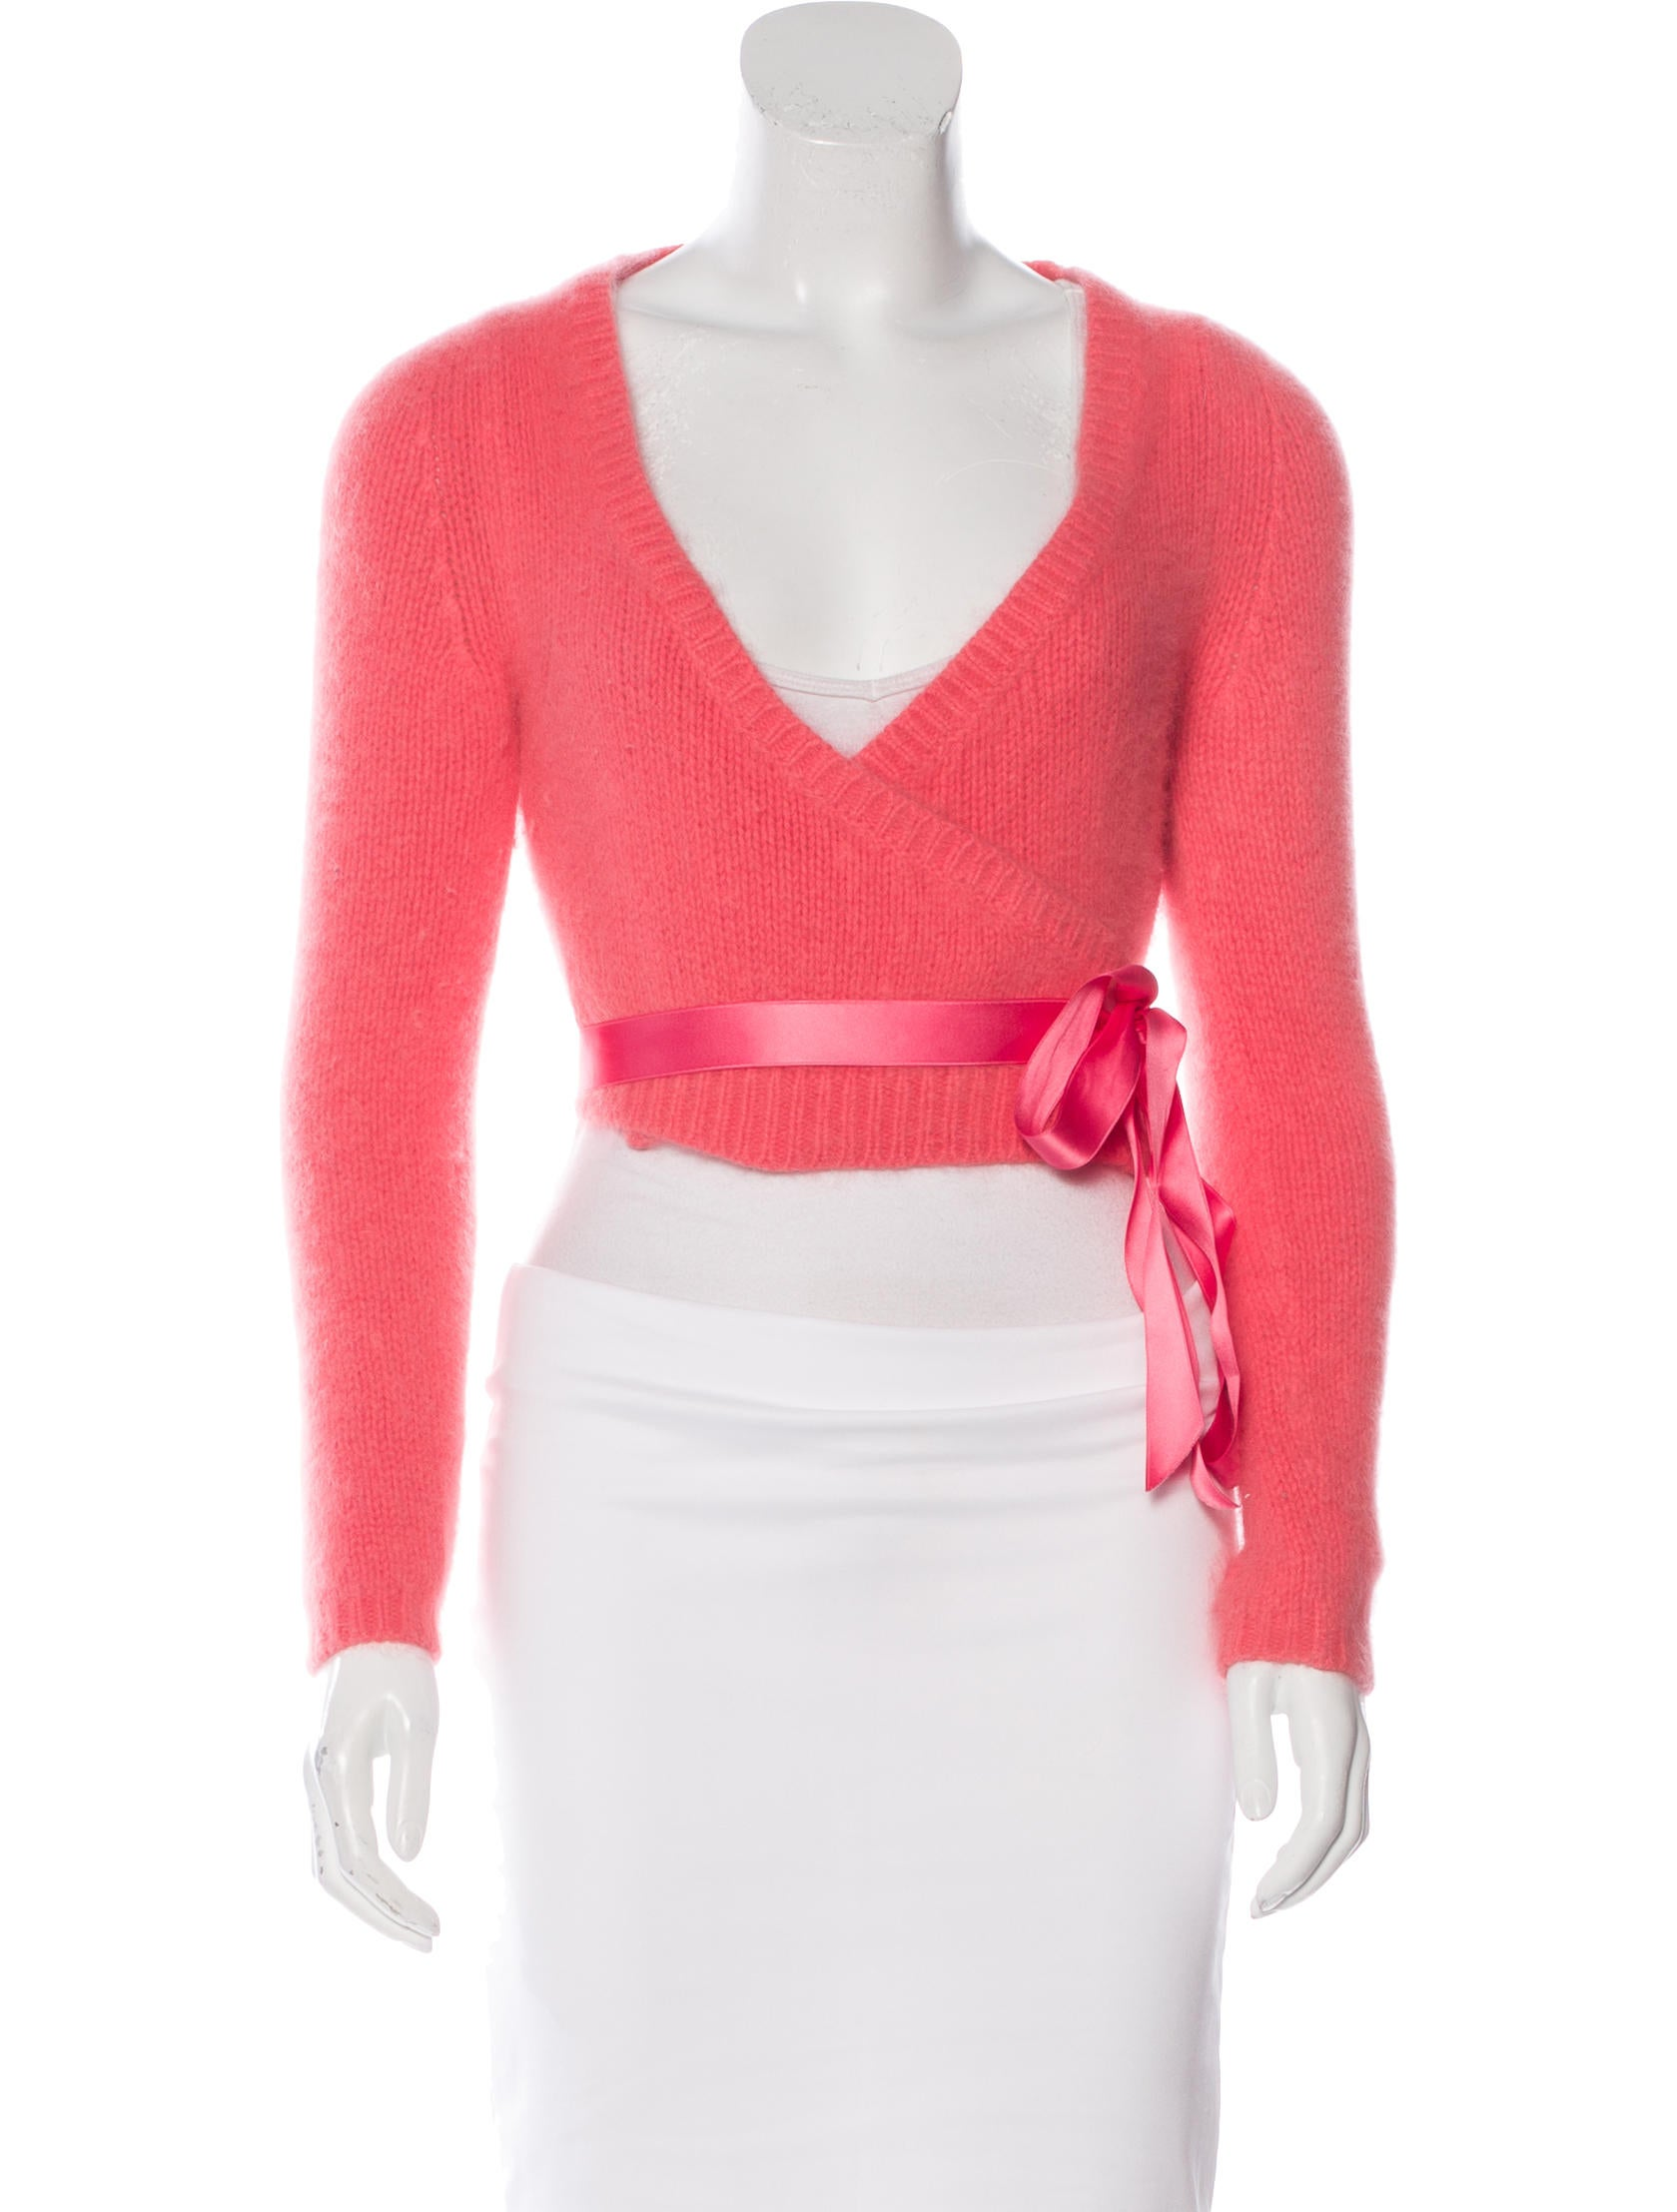 Angora Wrap Cardigan Full Zip Sweater